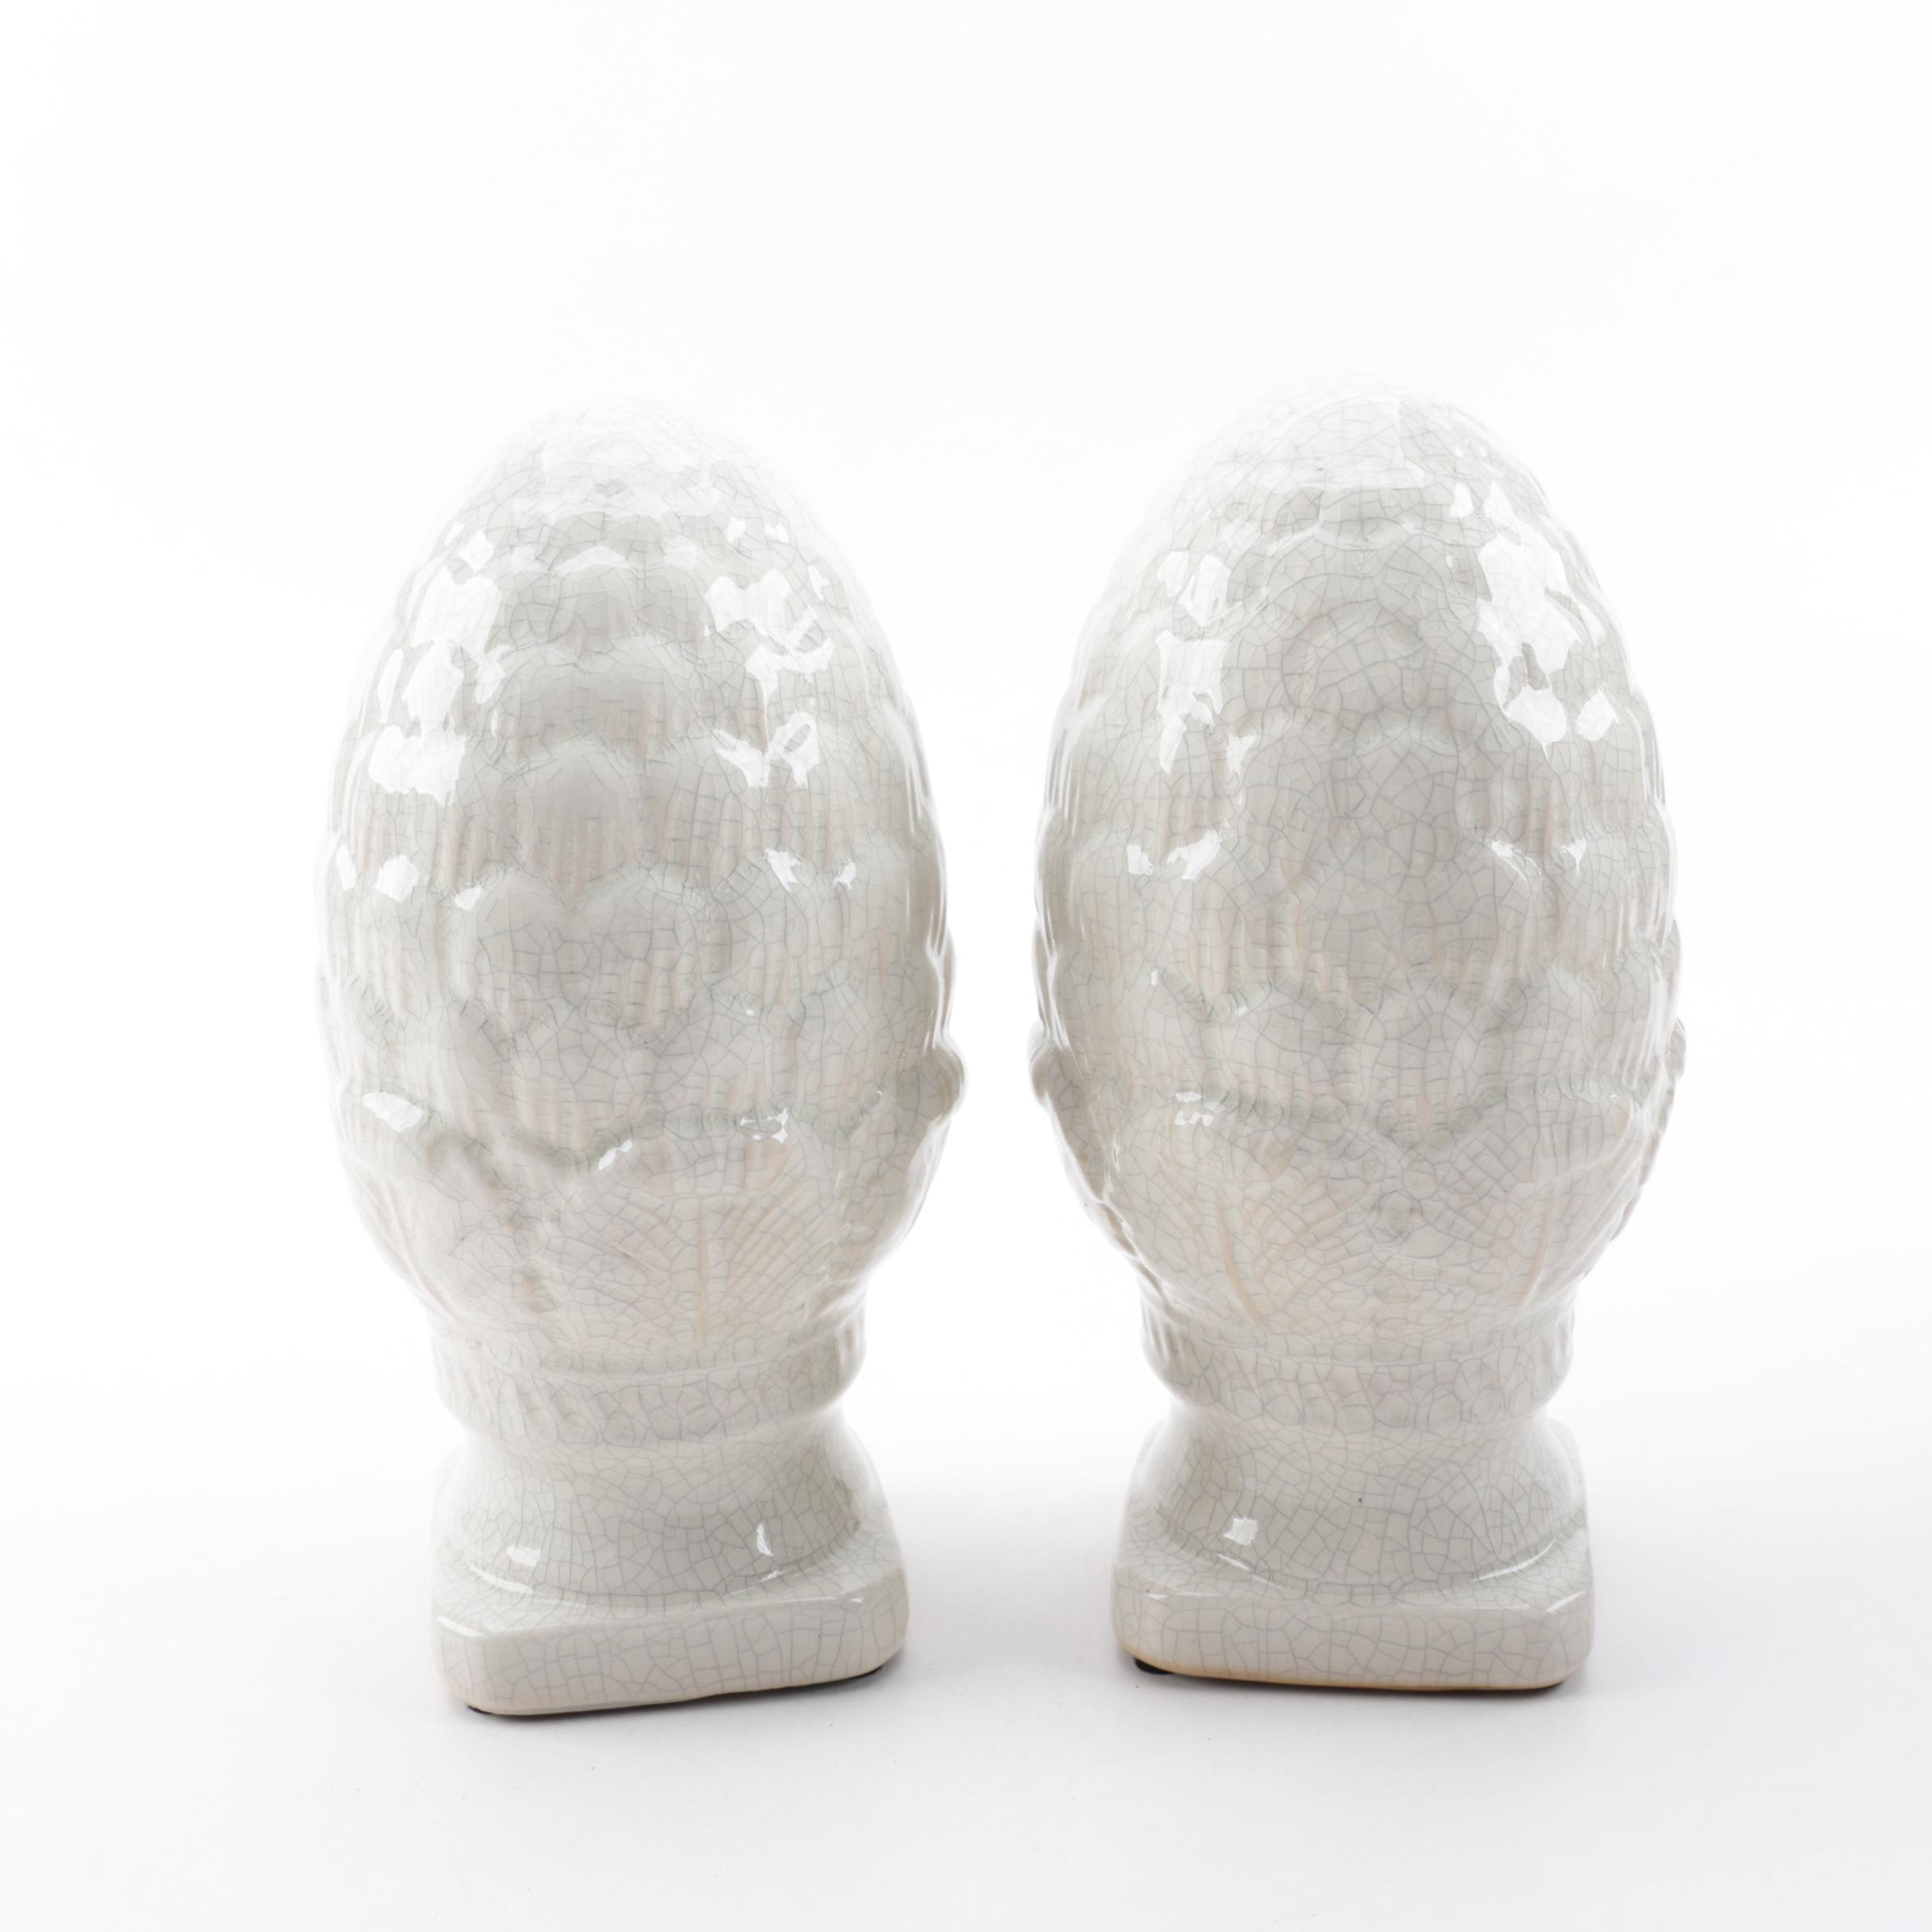 Ceramic Artichoke Finials with Craquelure Glaze